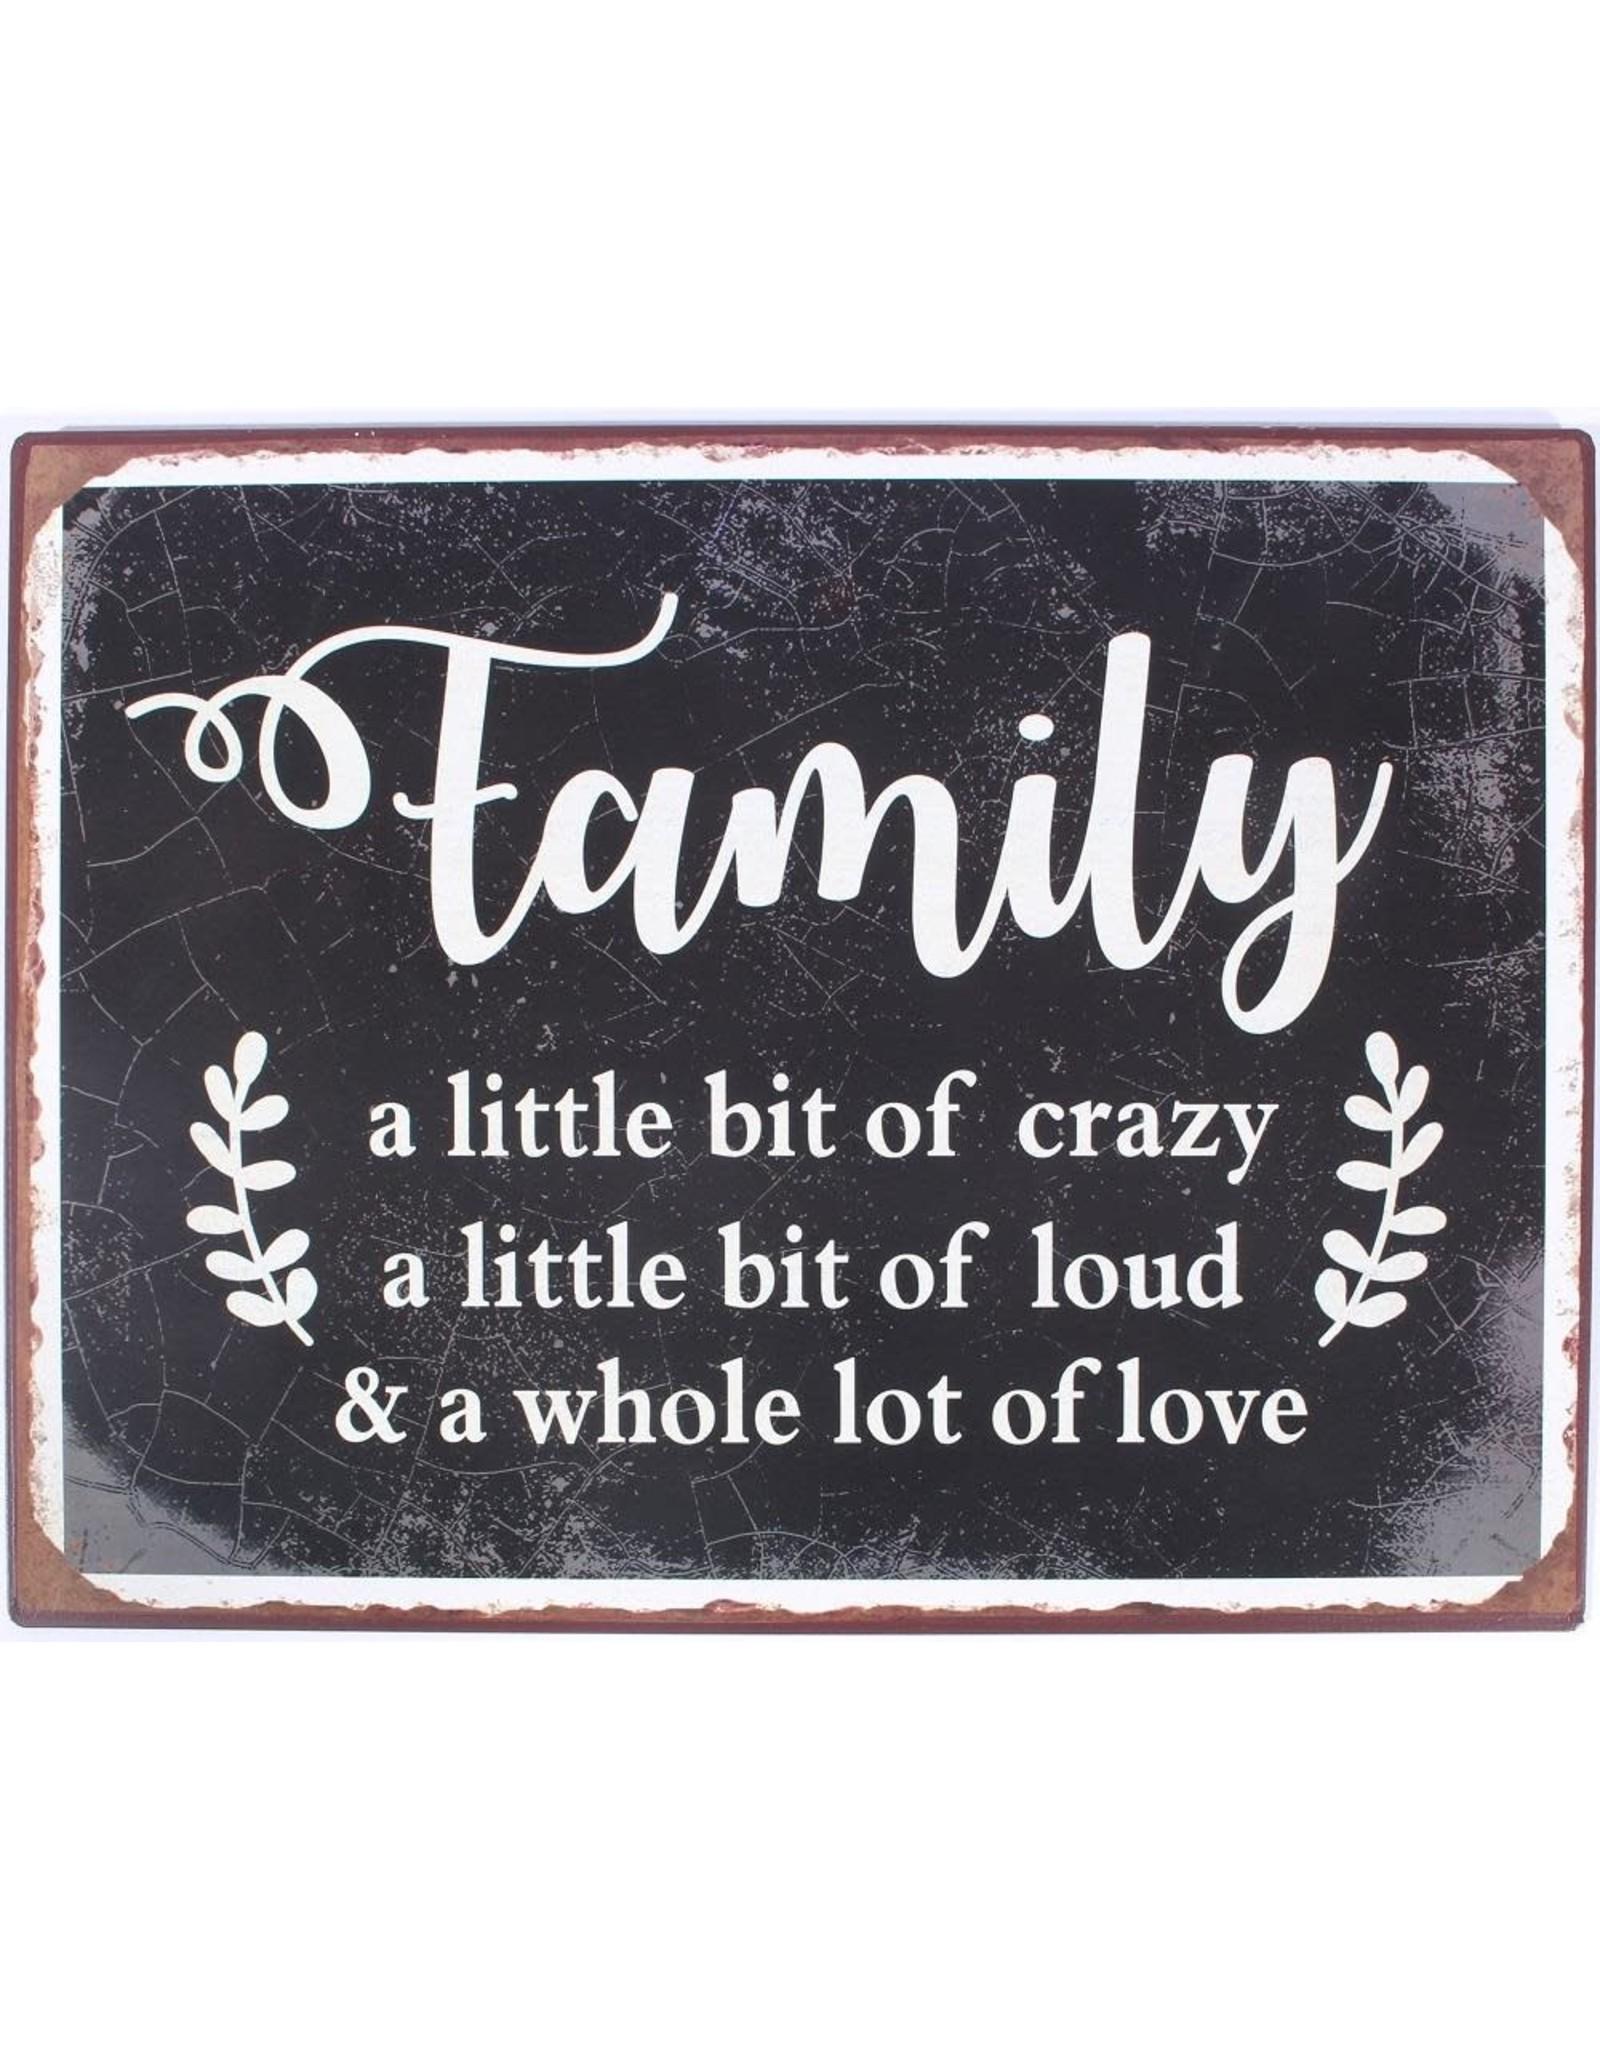 La Finesse hangbordje - family a little bit of crazy